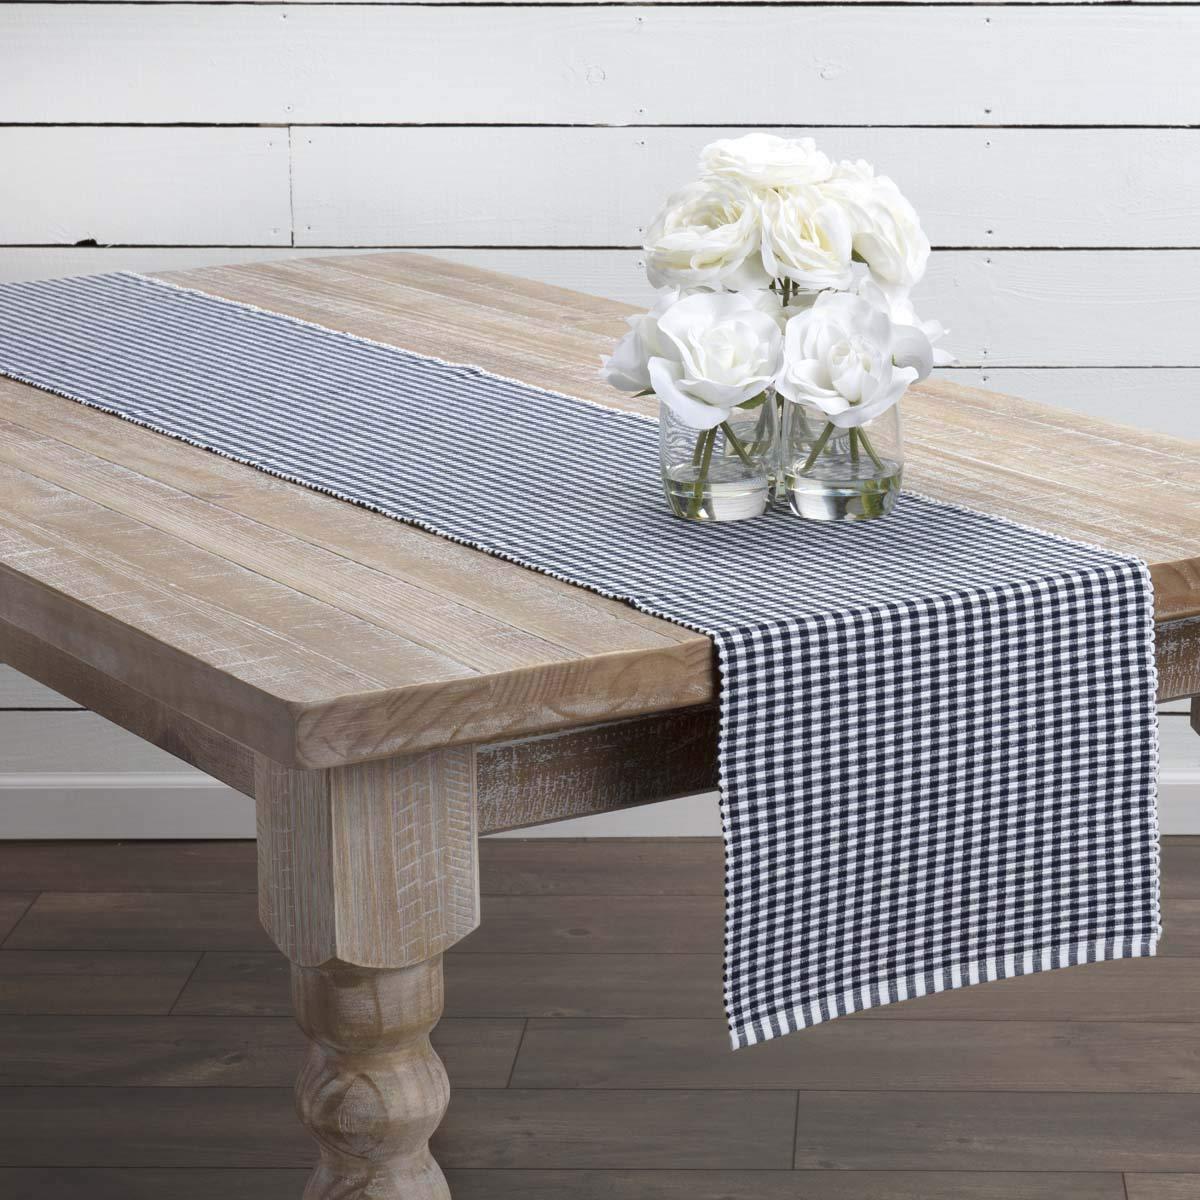 Tara Grey Ribbed Runner VHC Brands Farmhouse Tabletop /& Kitchen 13 x 72,